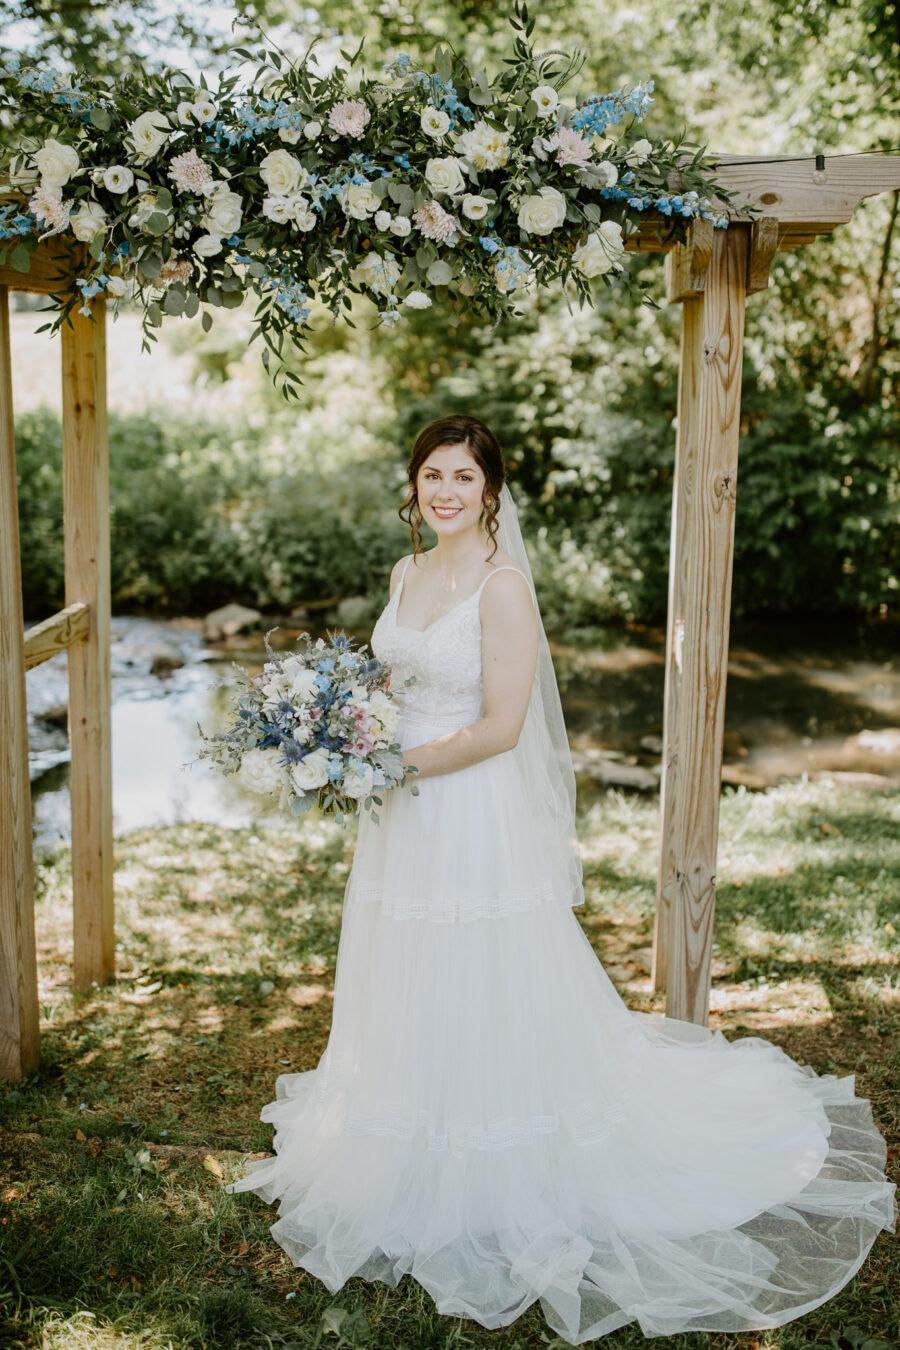 Bridal portrait: Vibrant Summer Wedding at Sinking Creek Farm featured on Nashville Bride Guide